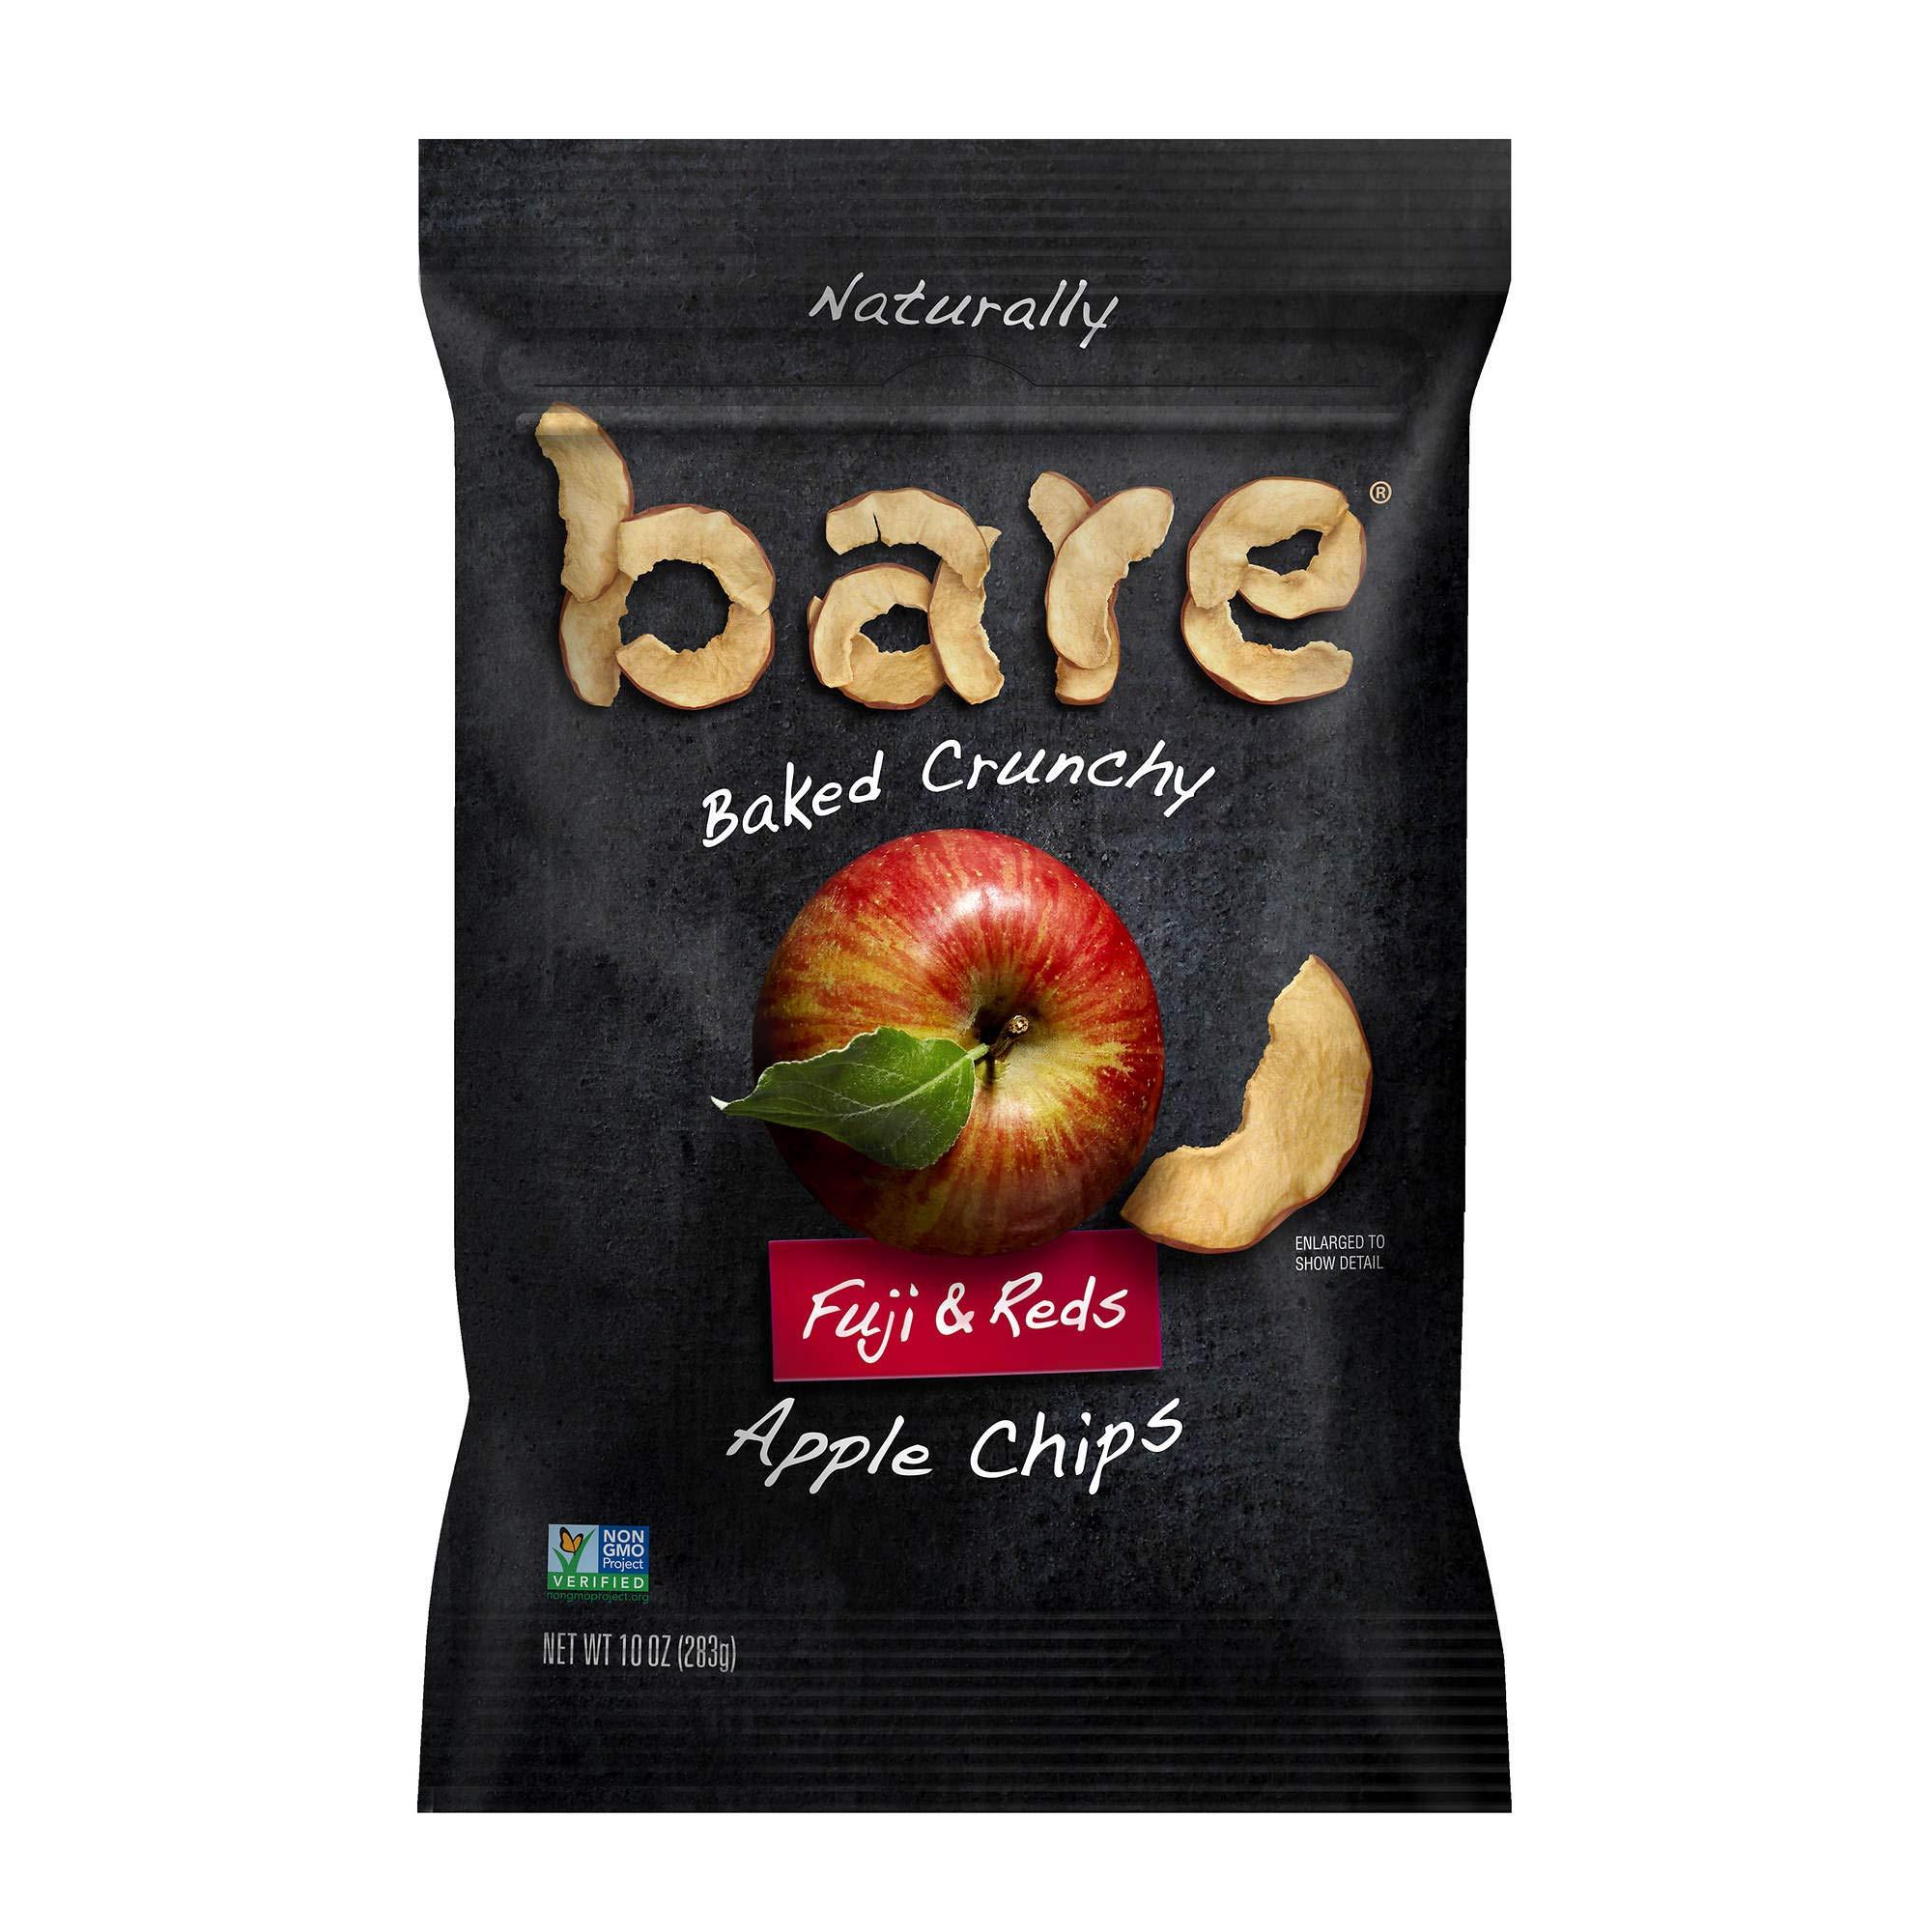 Bare Natural Apple Chips, Fuji & Reds, Gluten Free, Baked Crunchy Jumbo Bag 10 Ounces (283 g)